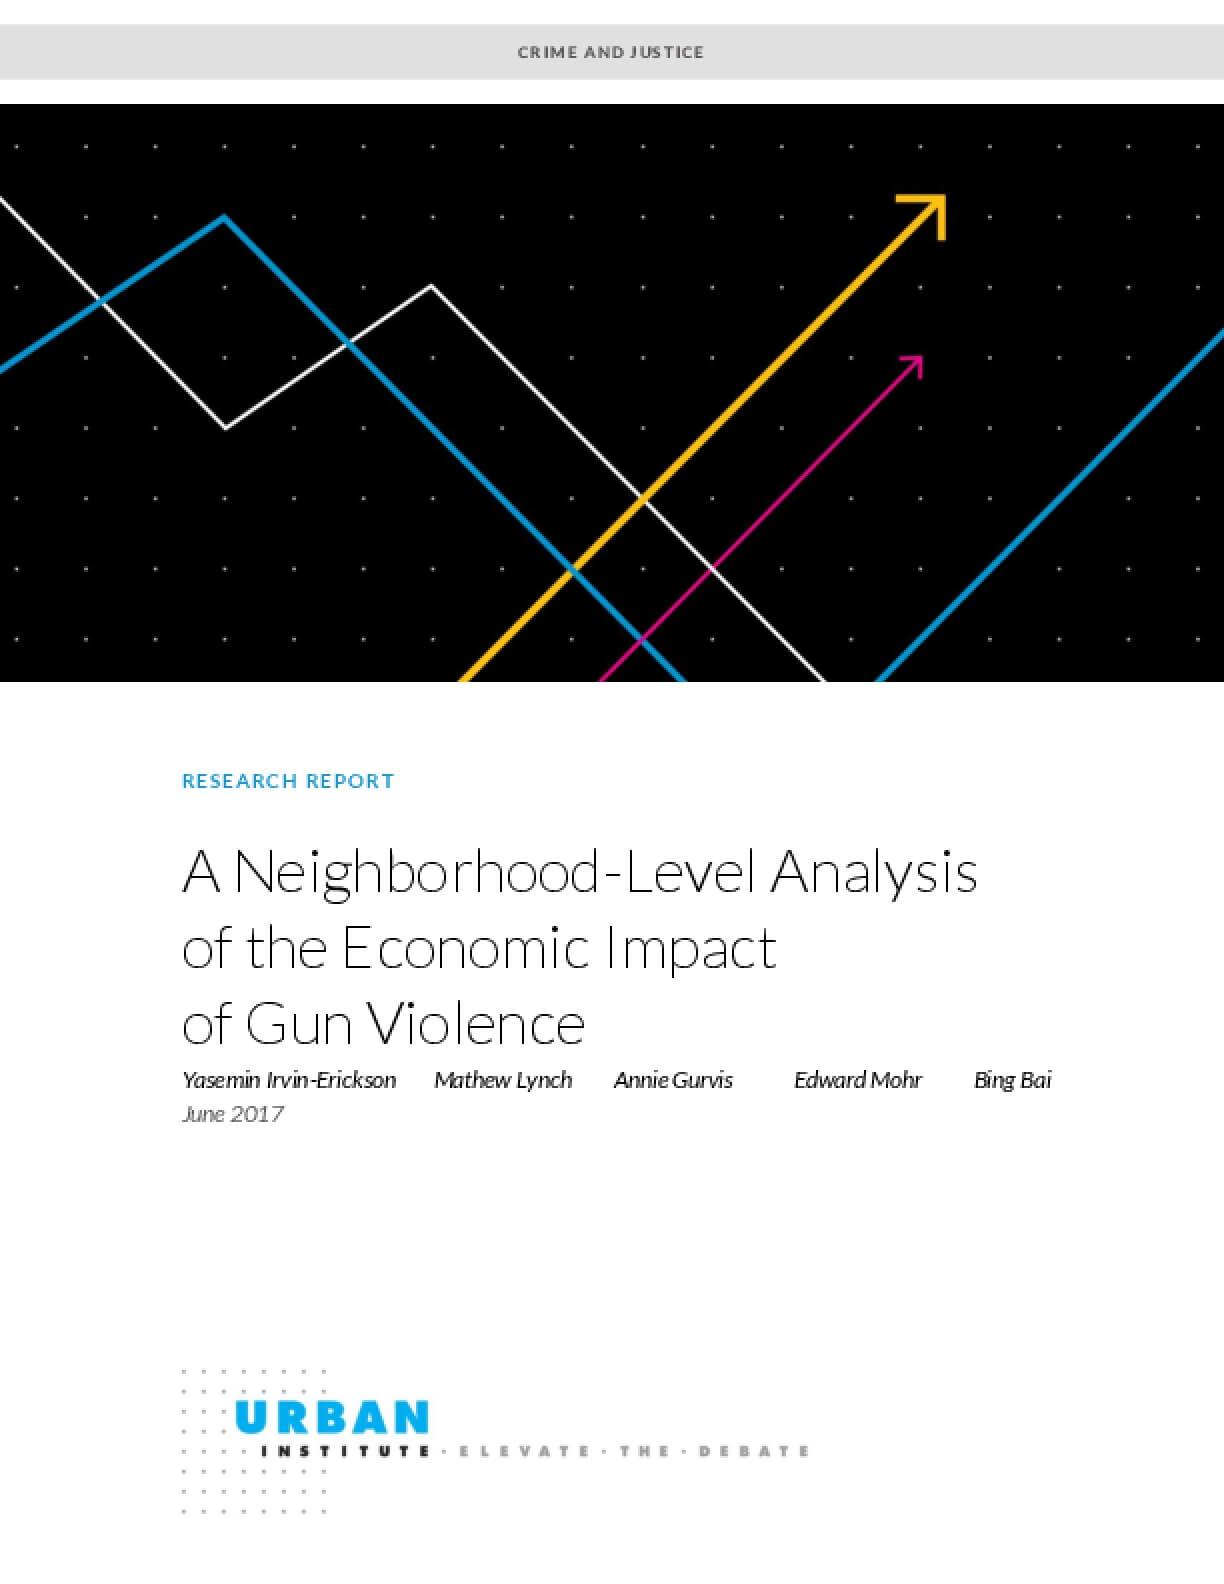 A Neighborhood-Level Analysis of the Economic Impact of Gun Violence